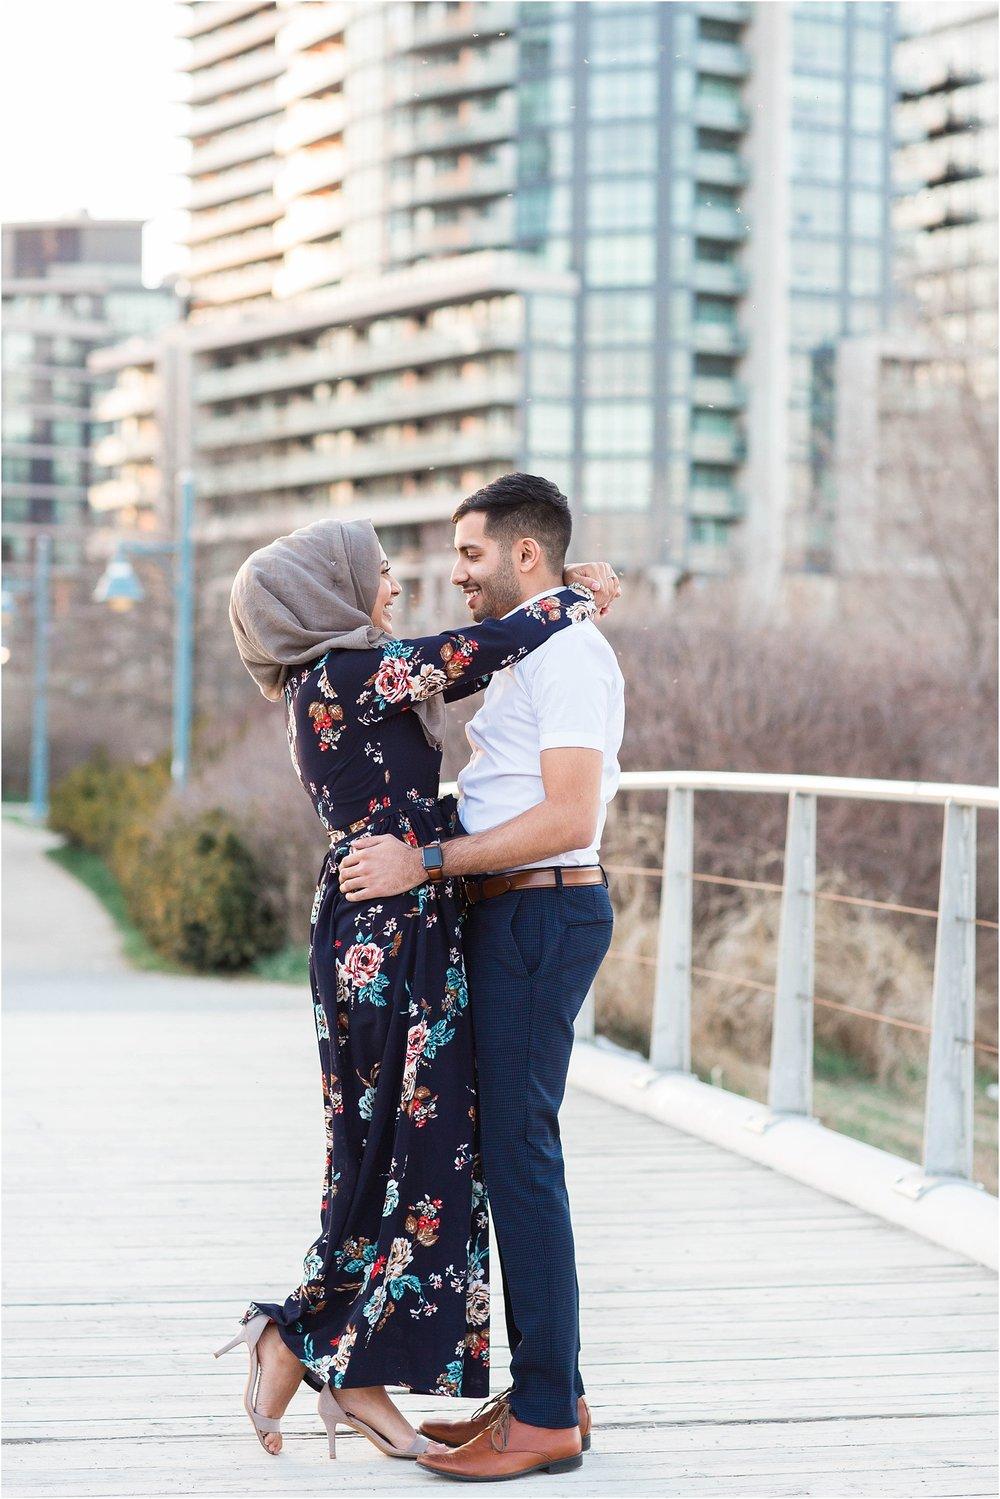 Distillery-District-Humber-Bay-Park-Engagement-Toronto-Mississauga-Brampton-Scarborough-GTA-Pakistani-Indian-Wedding-Engagement-Photographer-Photography_0045.jpg